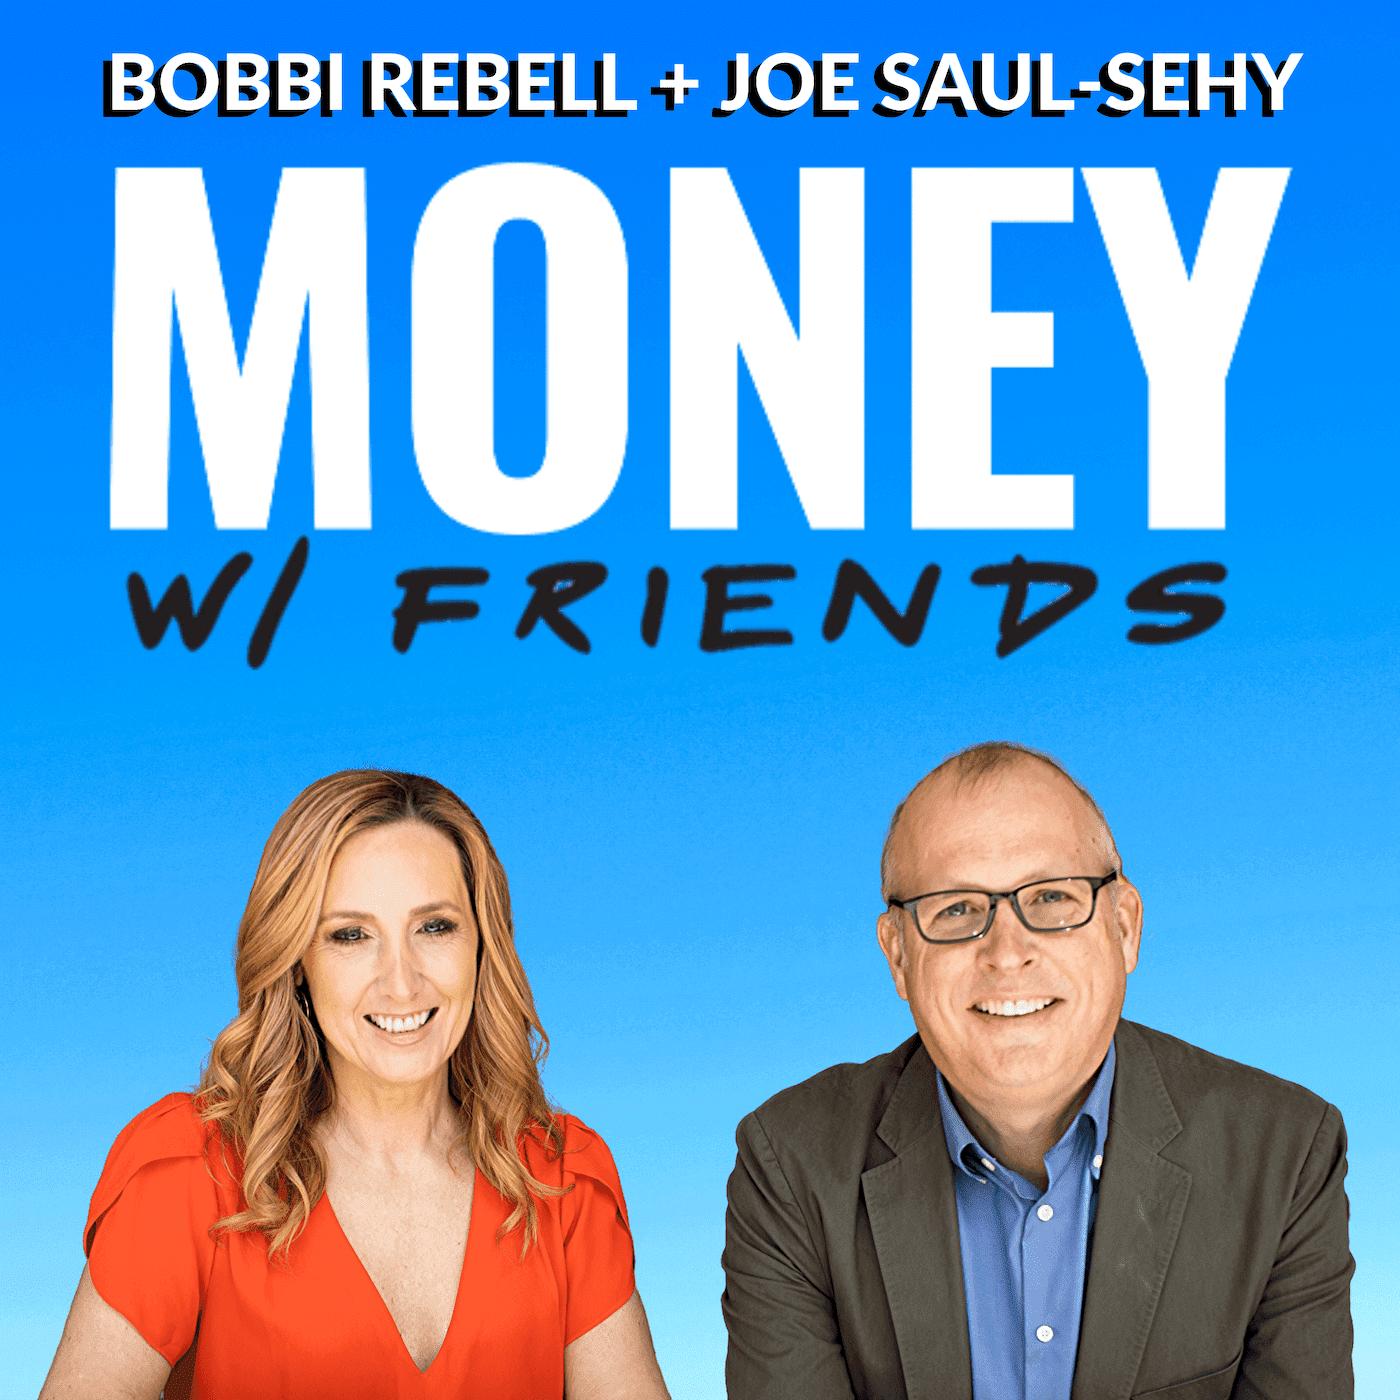 2021 Preview: Bobbi and Joe share their big plans for next year including a sabbatical